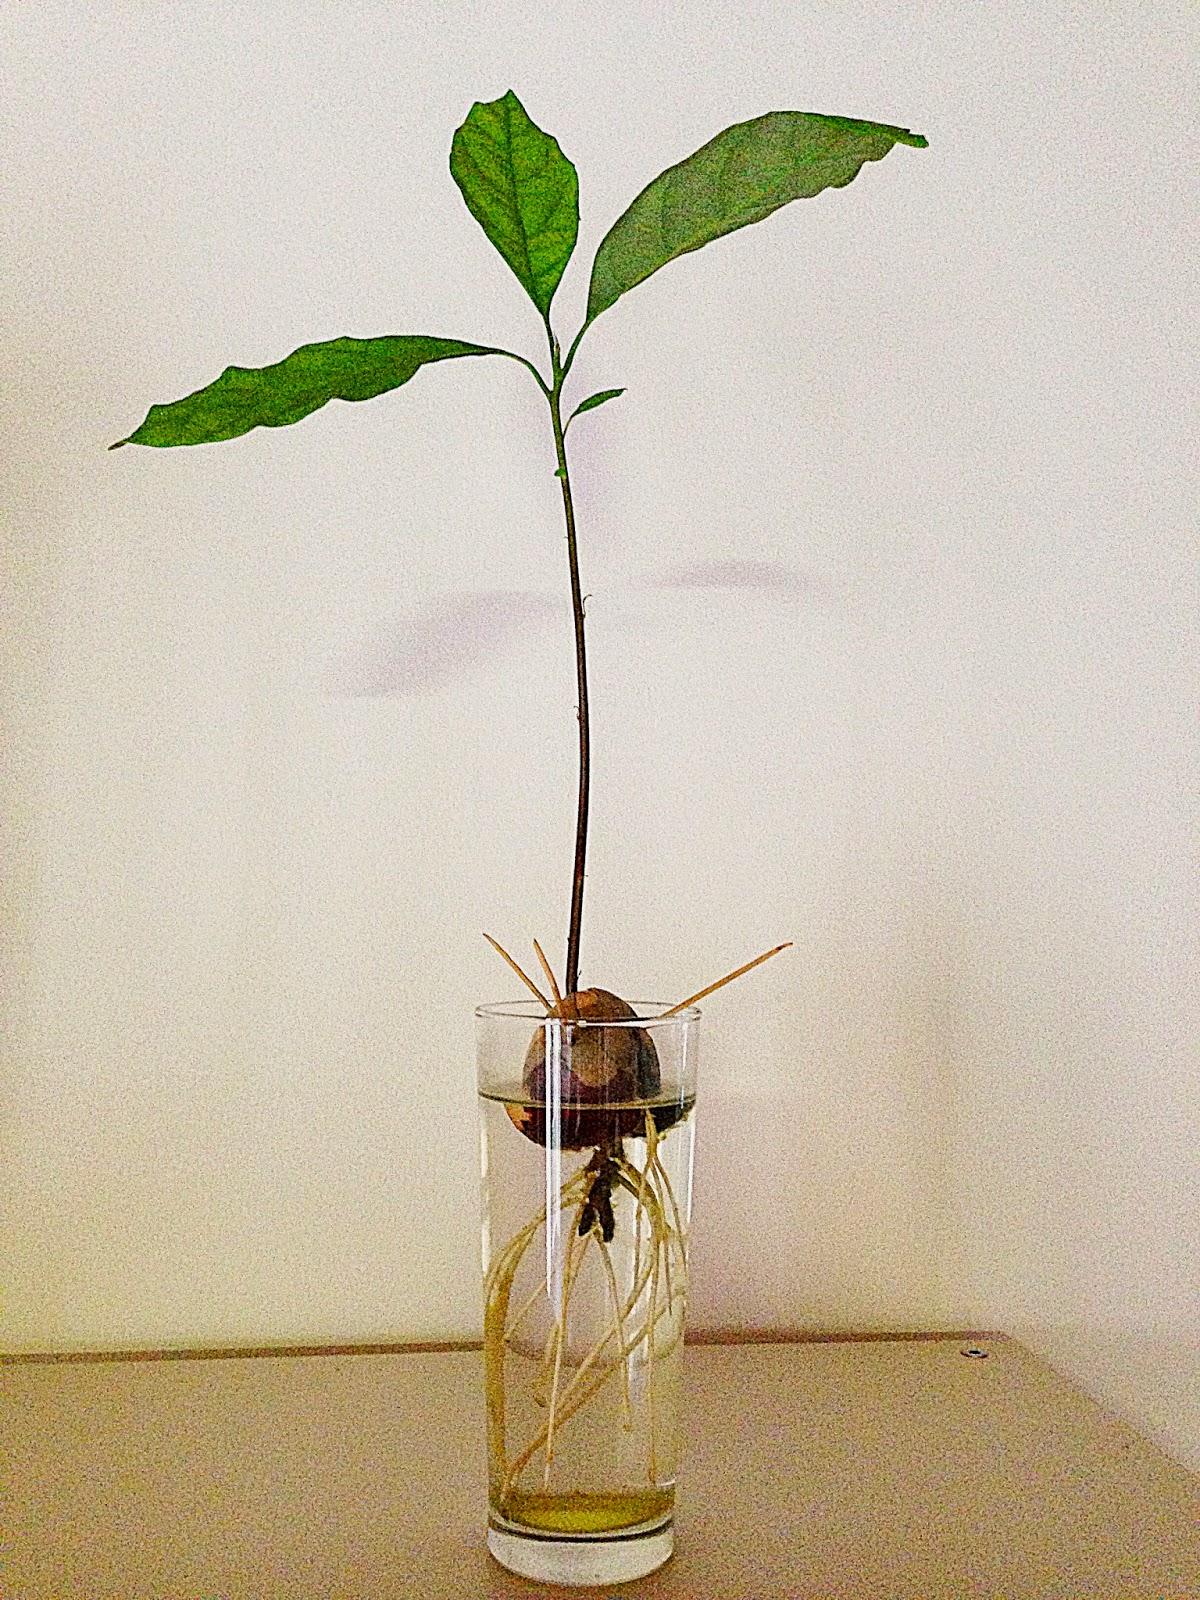 growing an avocado tree is super easy and very rewarding - Growing Avocado Trees